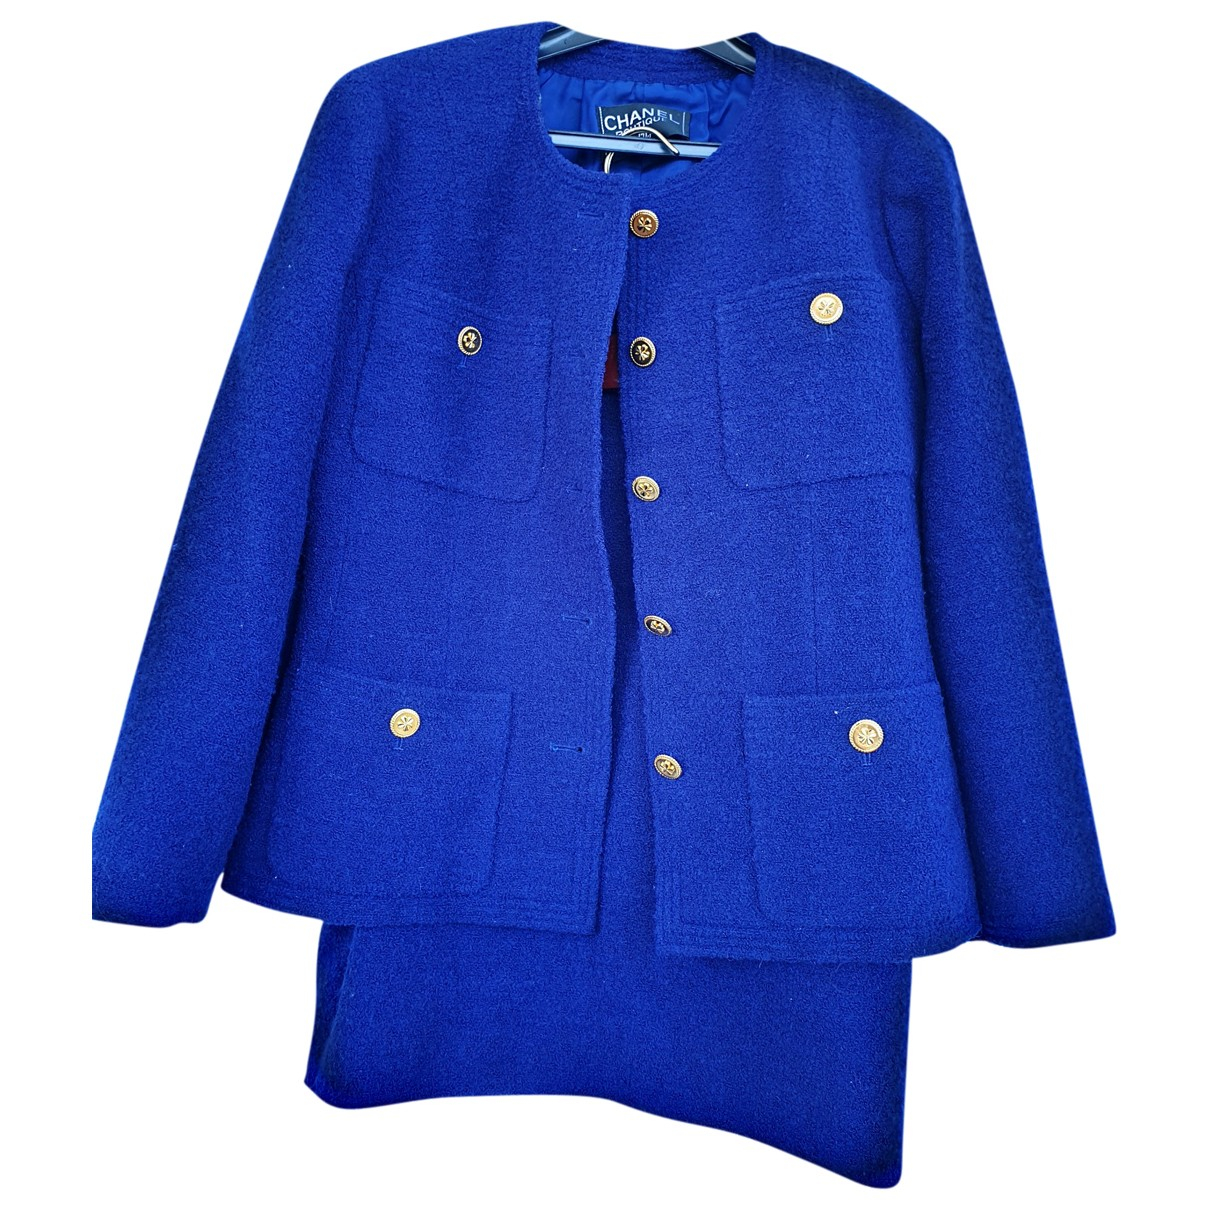 Chanel \N Jacke in  Blau Wolle